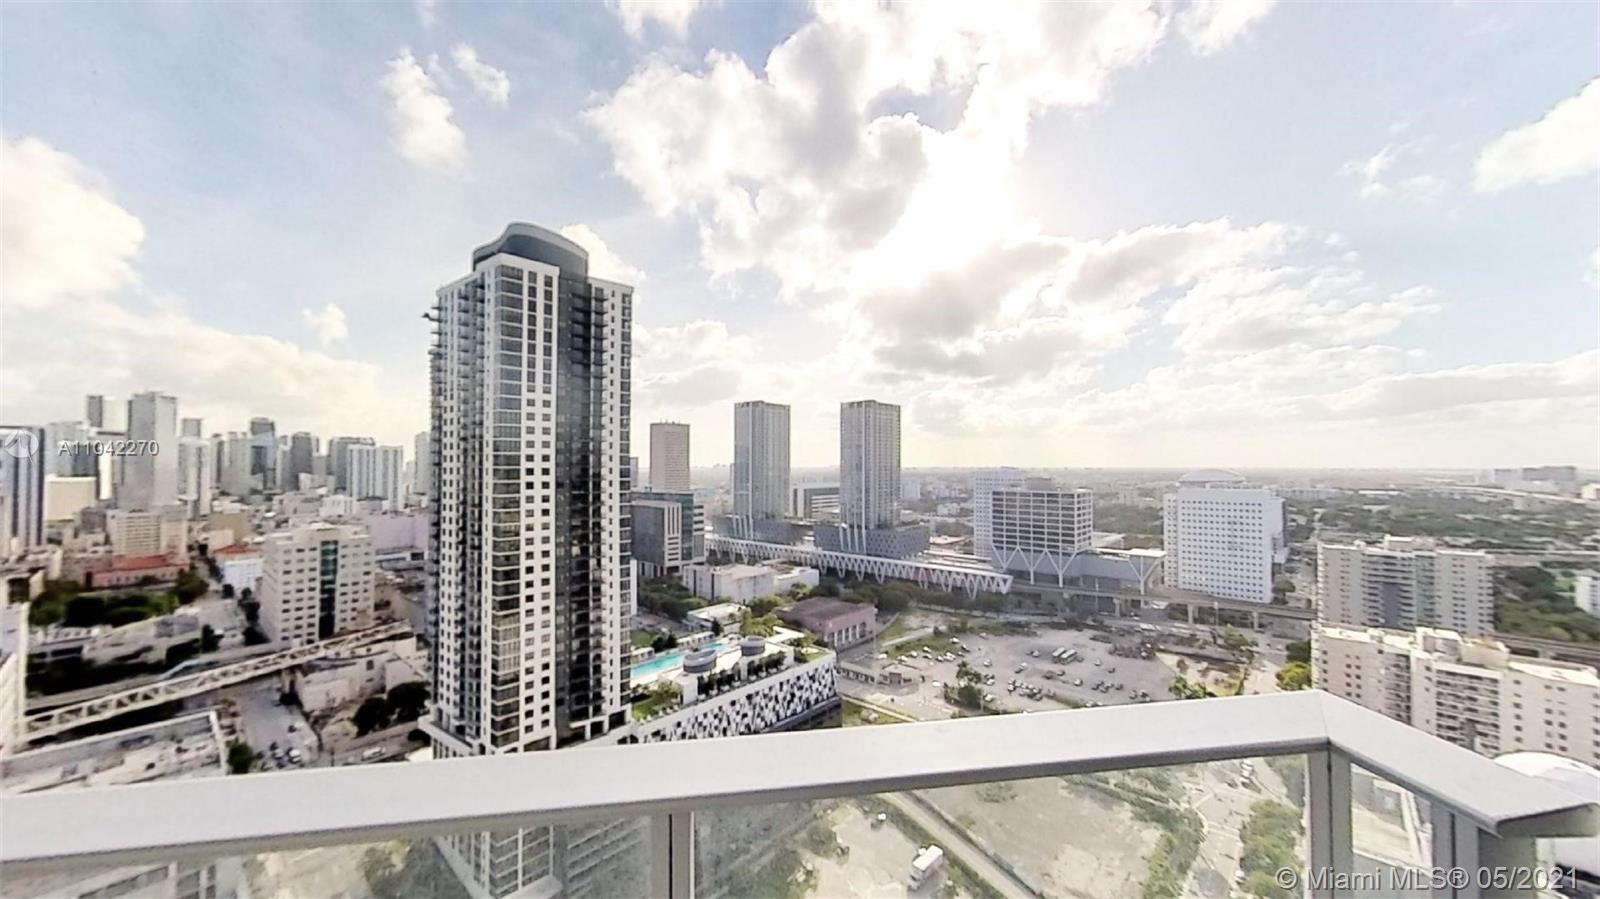 Paramount Miami Worldcenter #2712 - 02 - photo